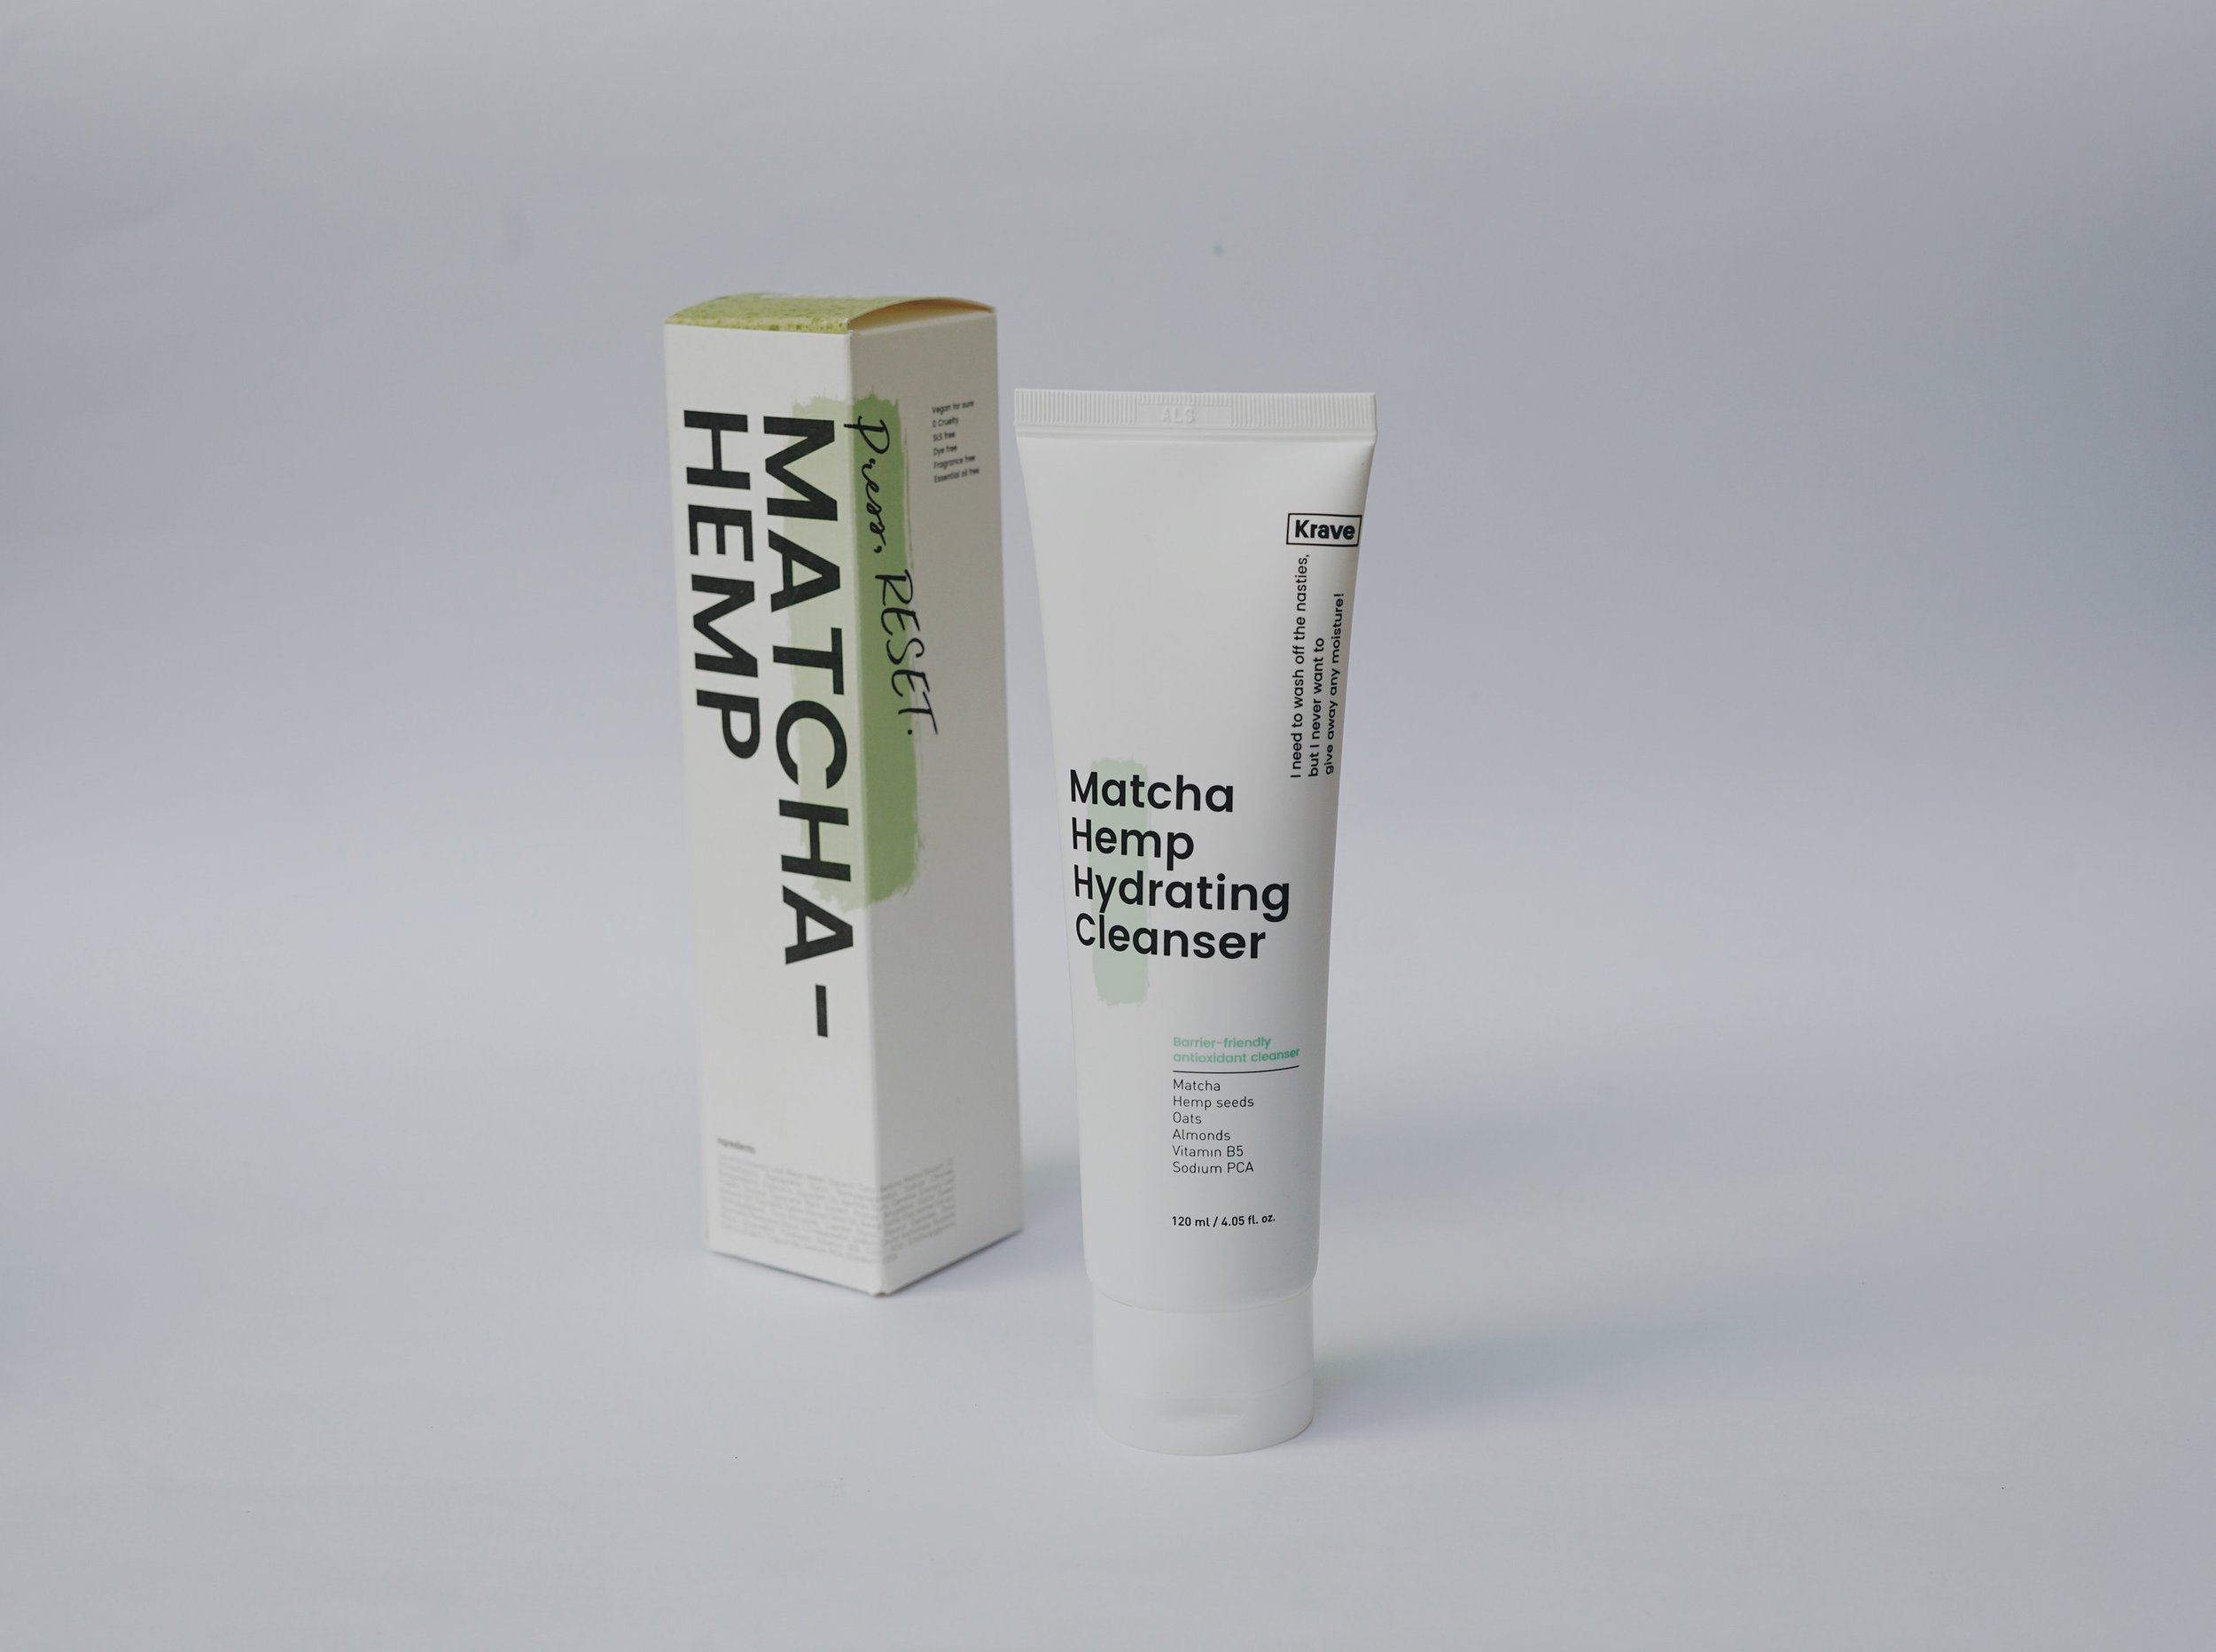 Krave Beauty's Matcha Hemp Hydrating Cleanser